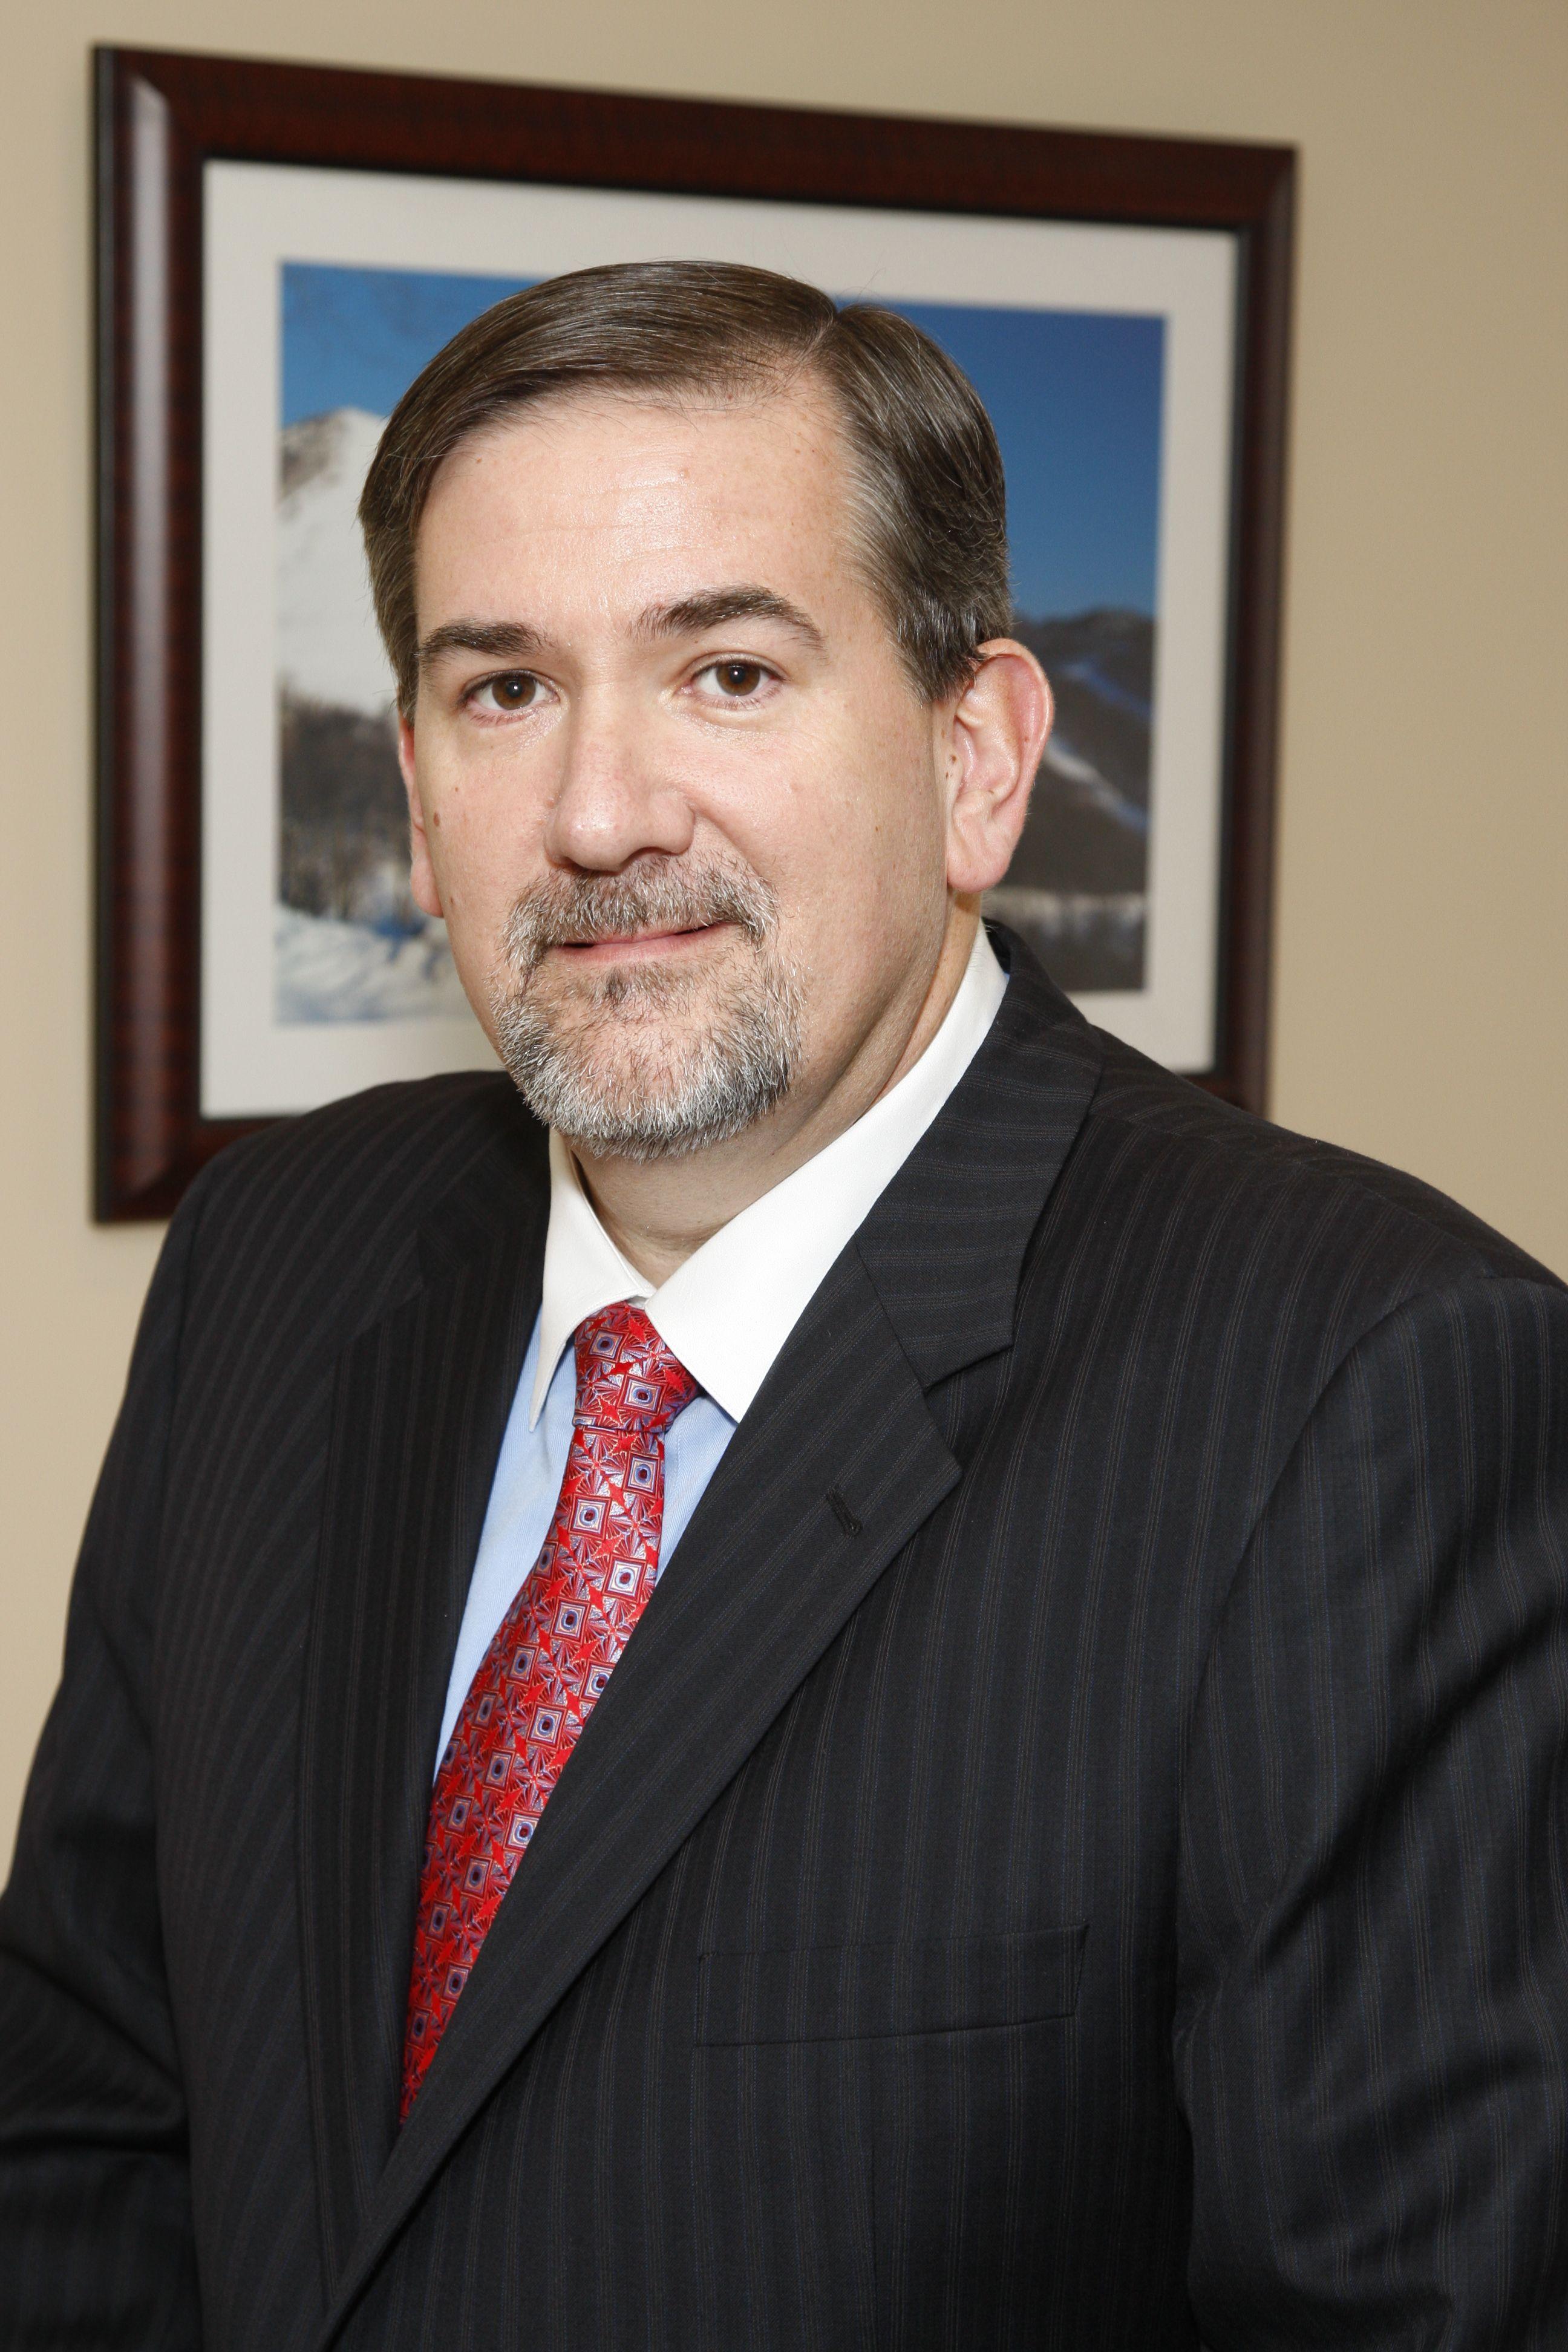 CEO of Jones Apparel Group, Inc., Wes Card (L) and John McClain.John McClain, New York